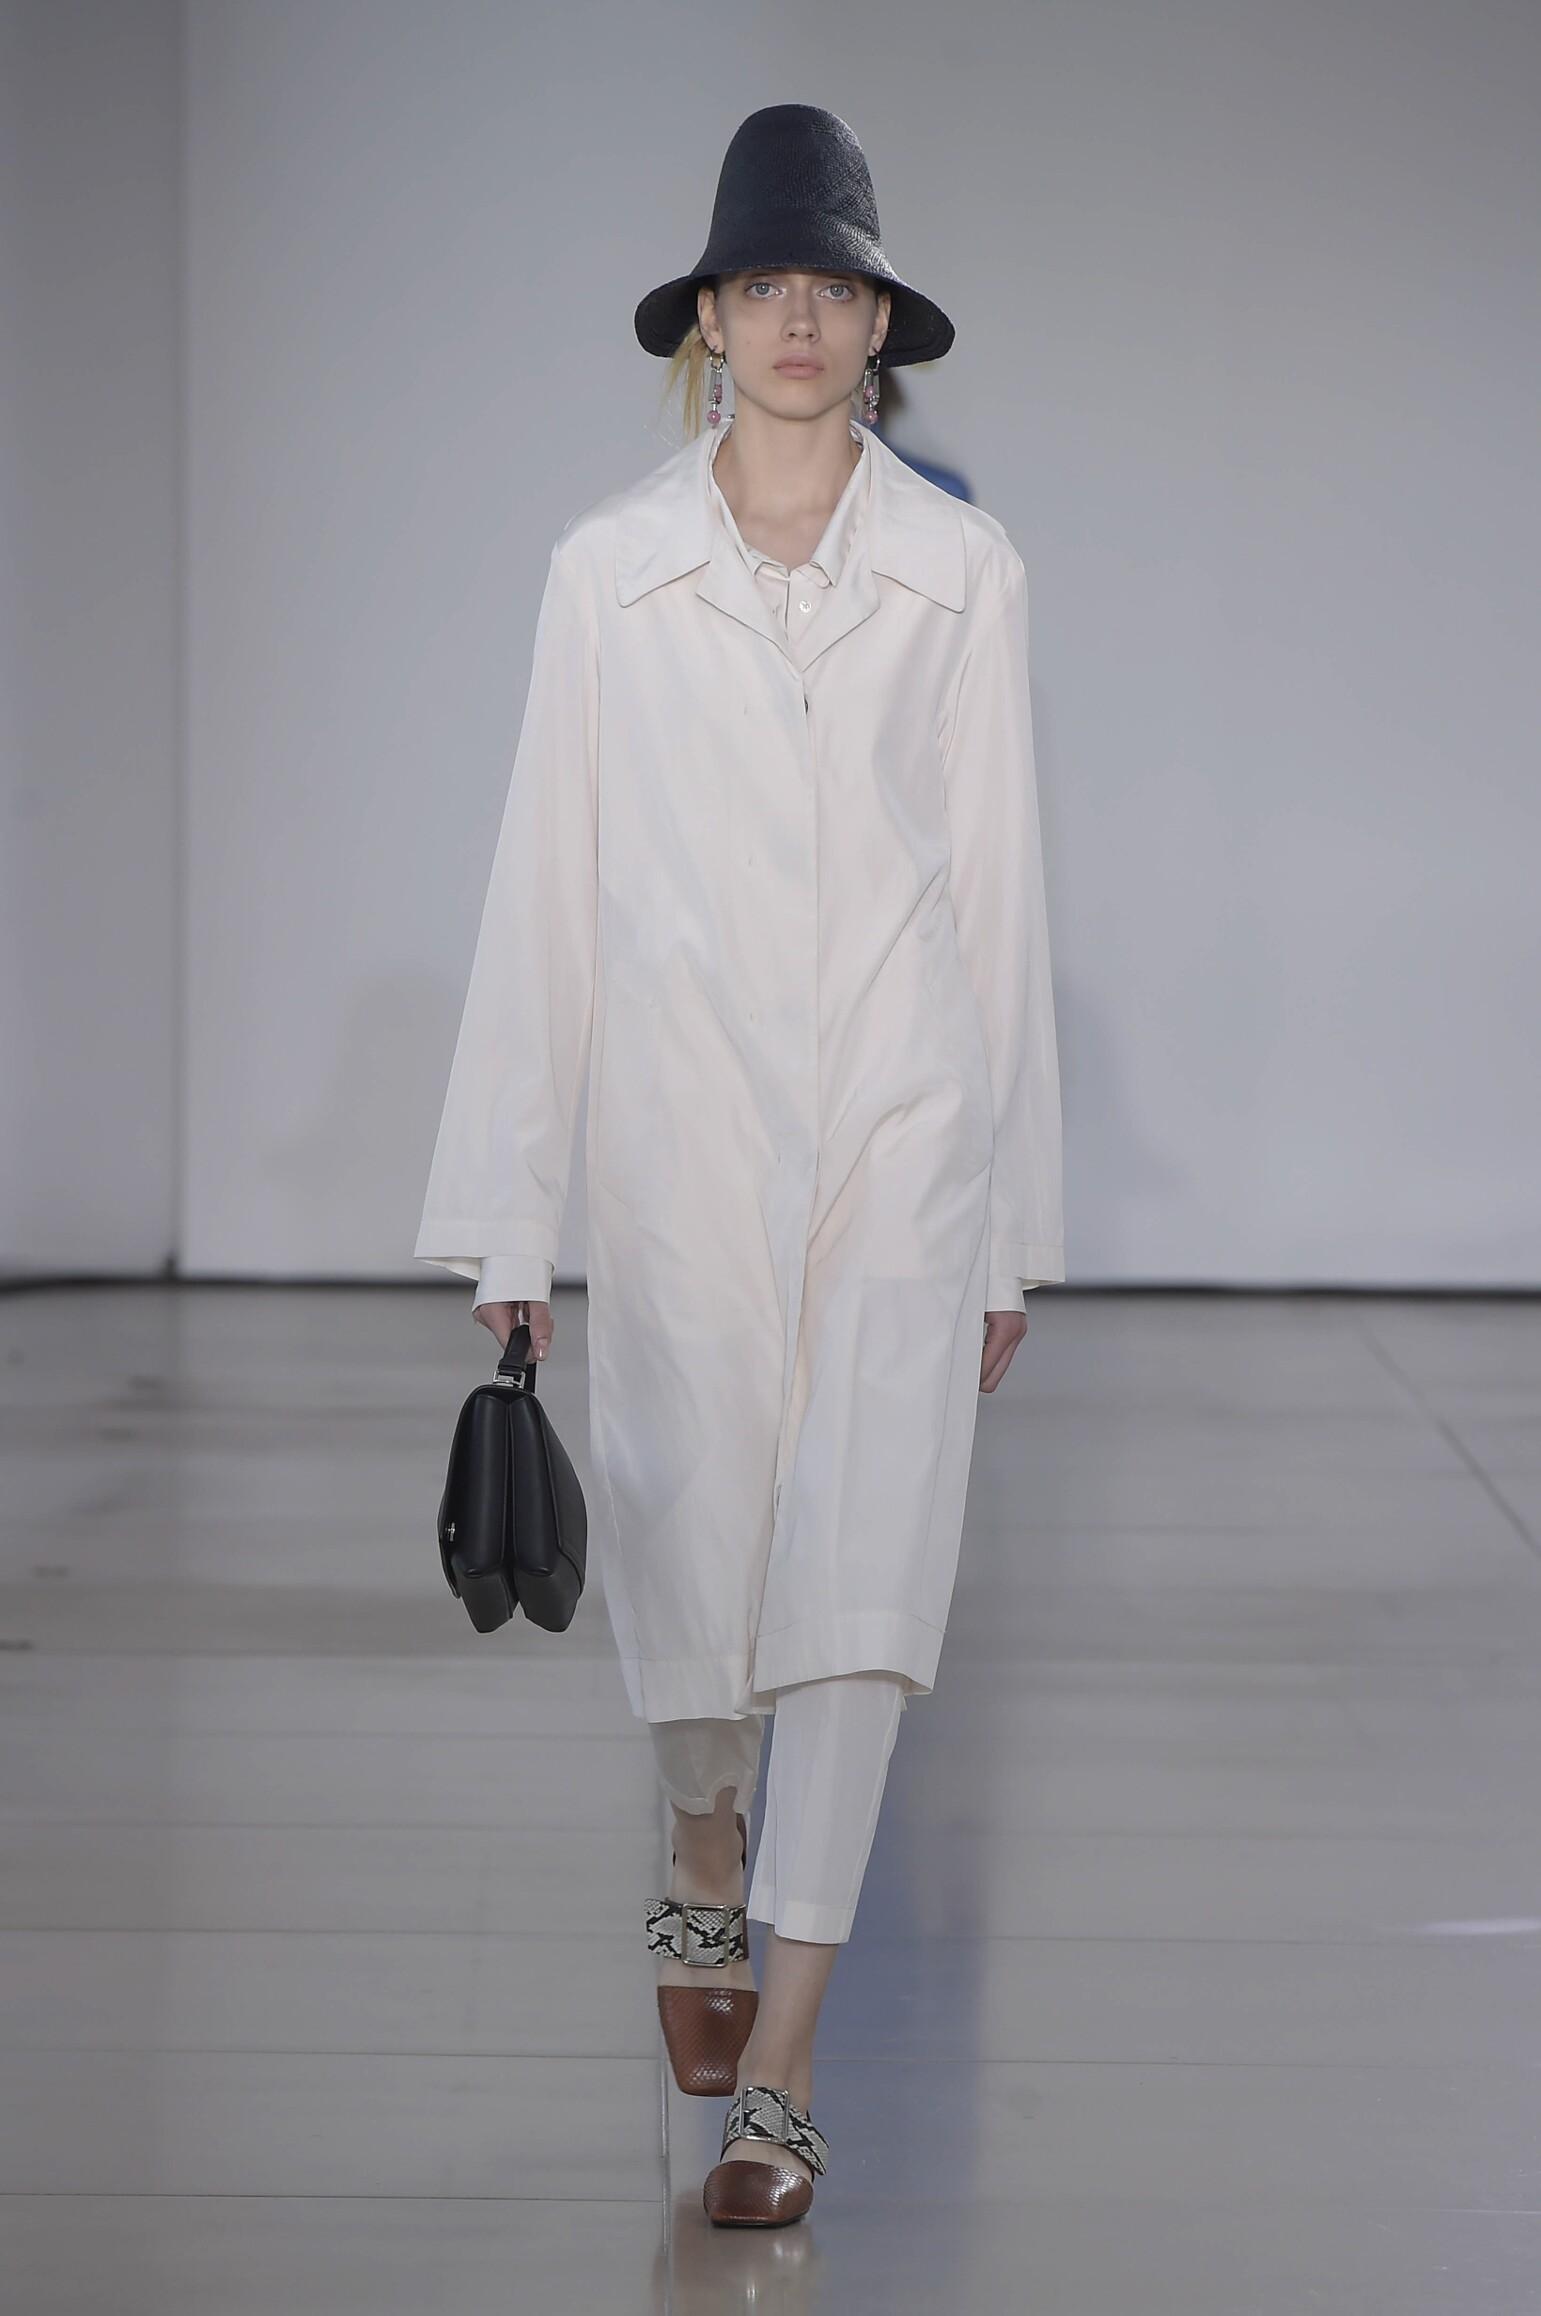 Jil Sander Women's Collection 2016